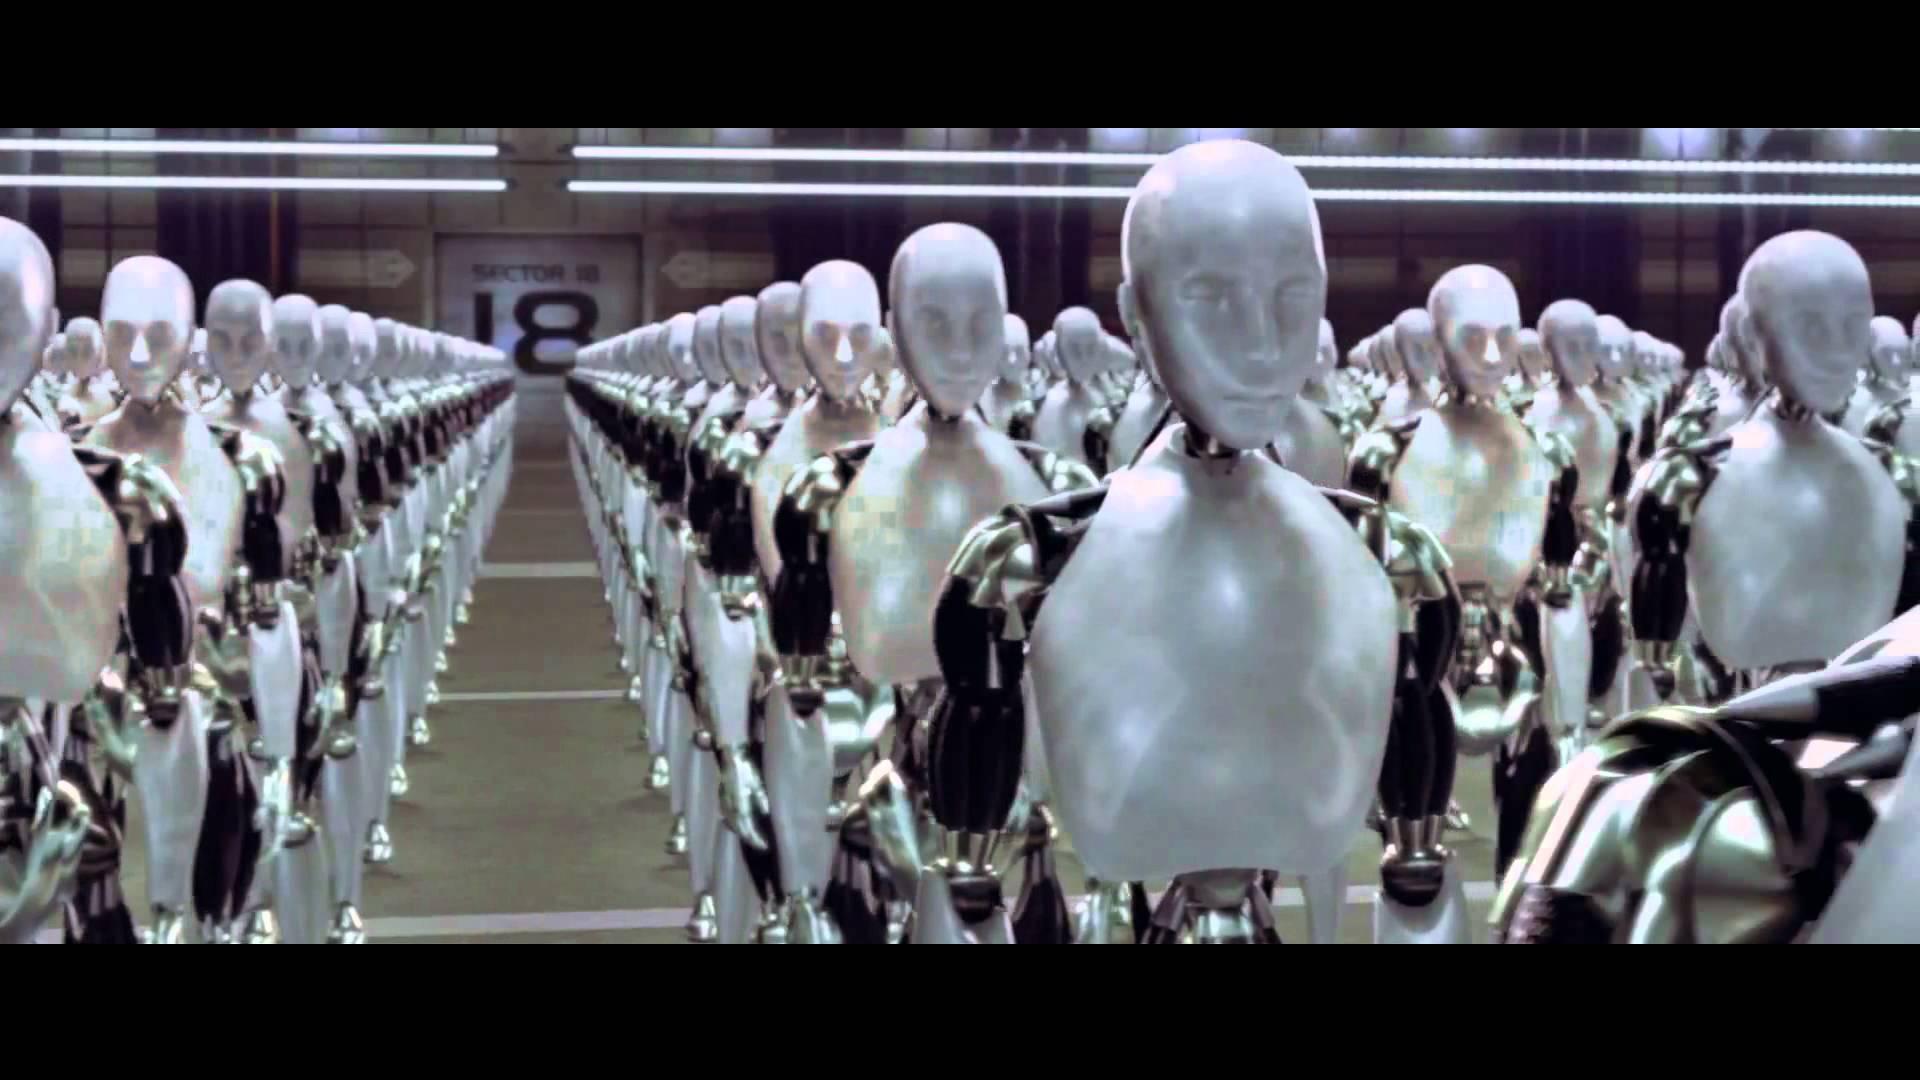 HQ I, Robot Wallpapers | File 148.22Kb